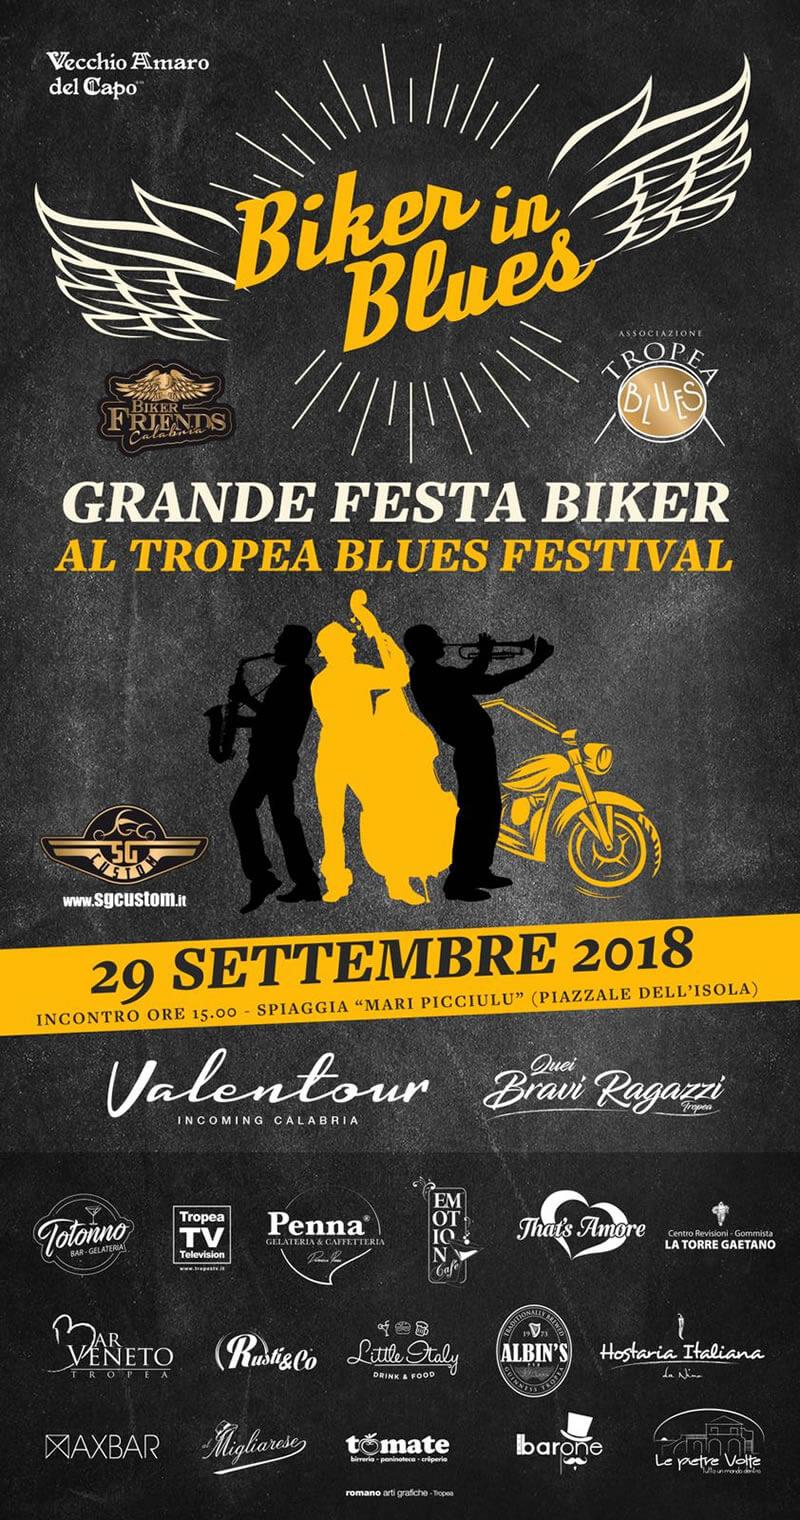 Biker in Blues 29 settembre 2018 a Tropea locandina